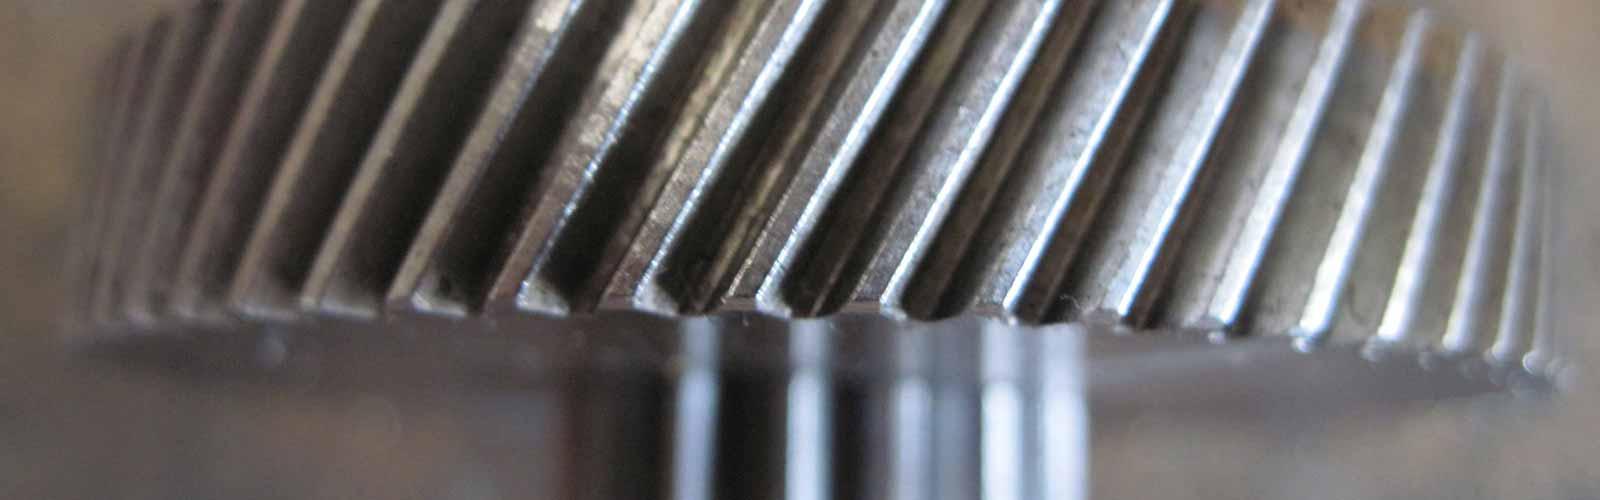 Gear cutting, yorkshire, allan-green-acetarc-spur-gear-gear-cutting